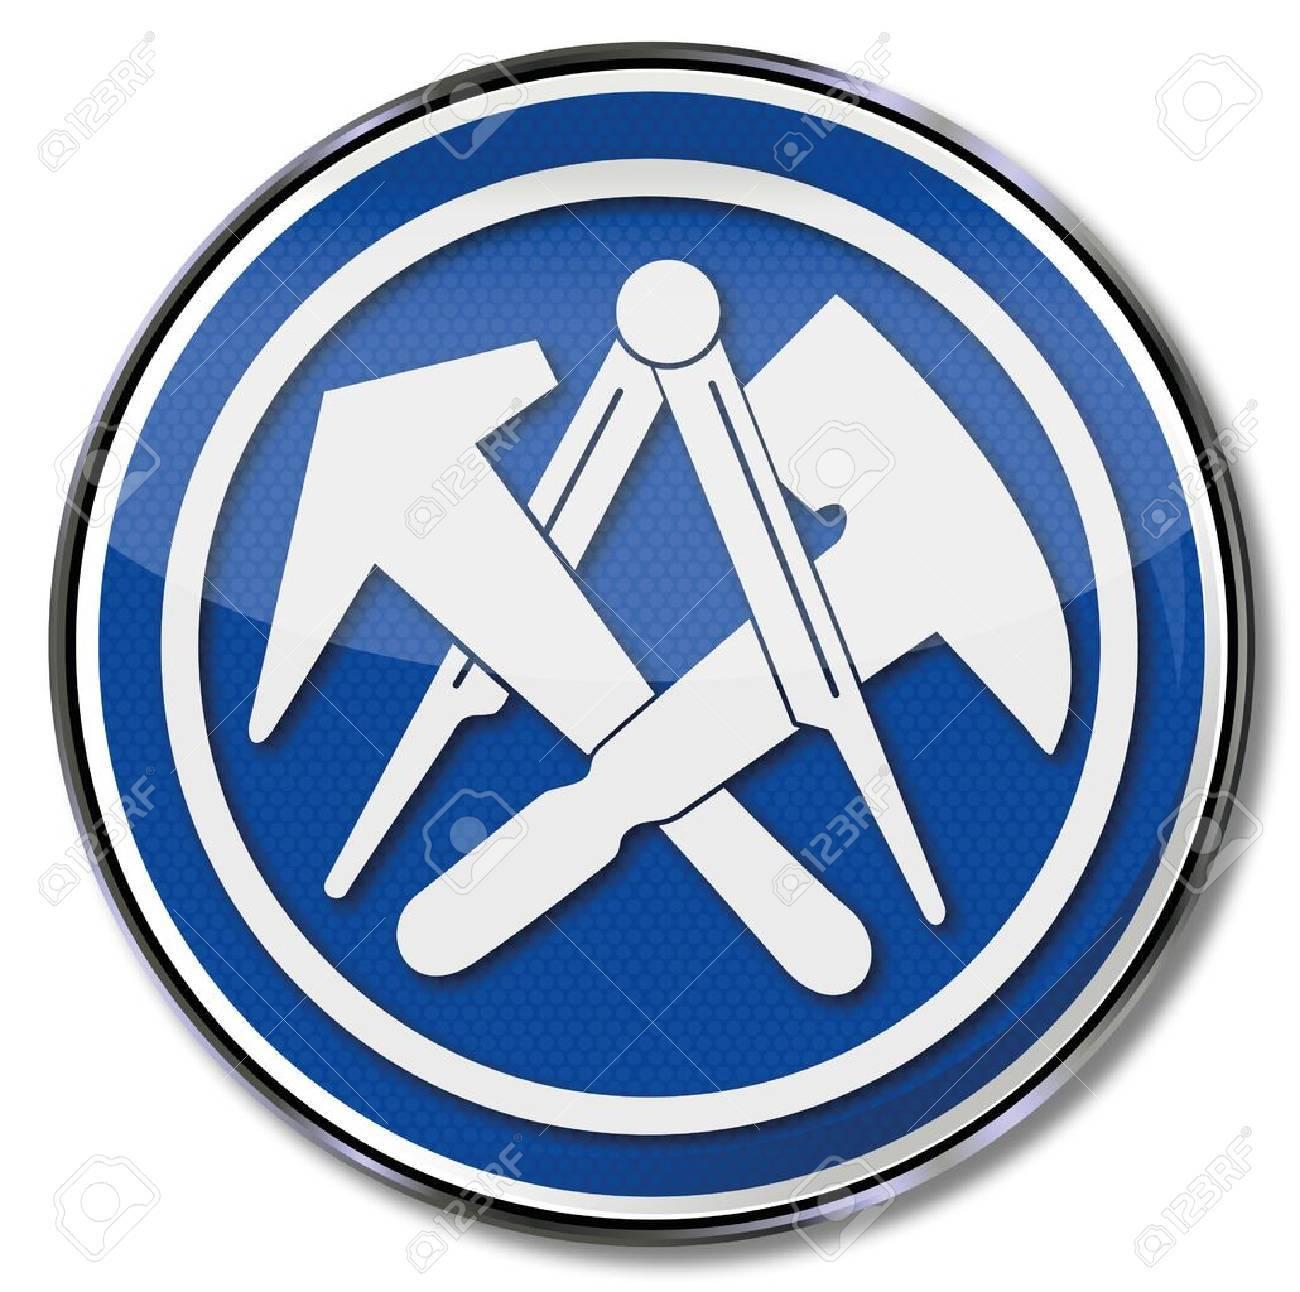 Dachdecker symbol  Dachdecker Lizenzfreie Vektorgrafiken Kaufen: 123RF